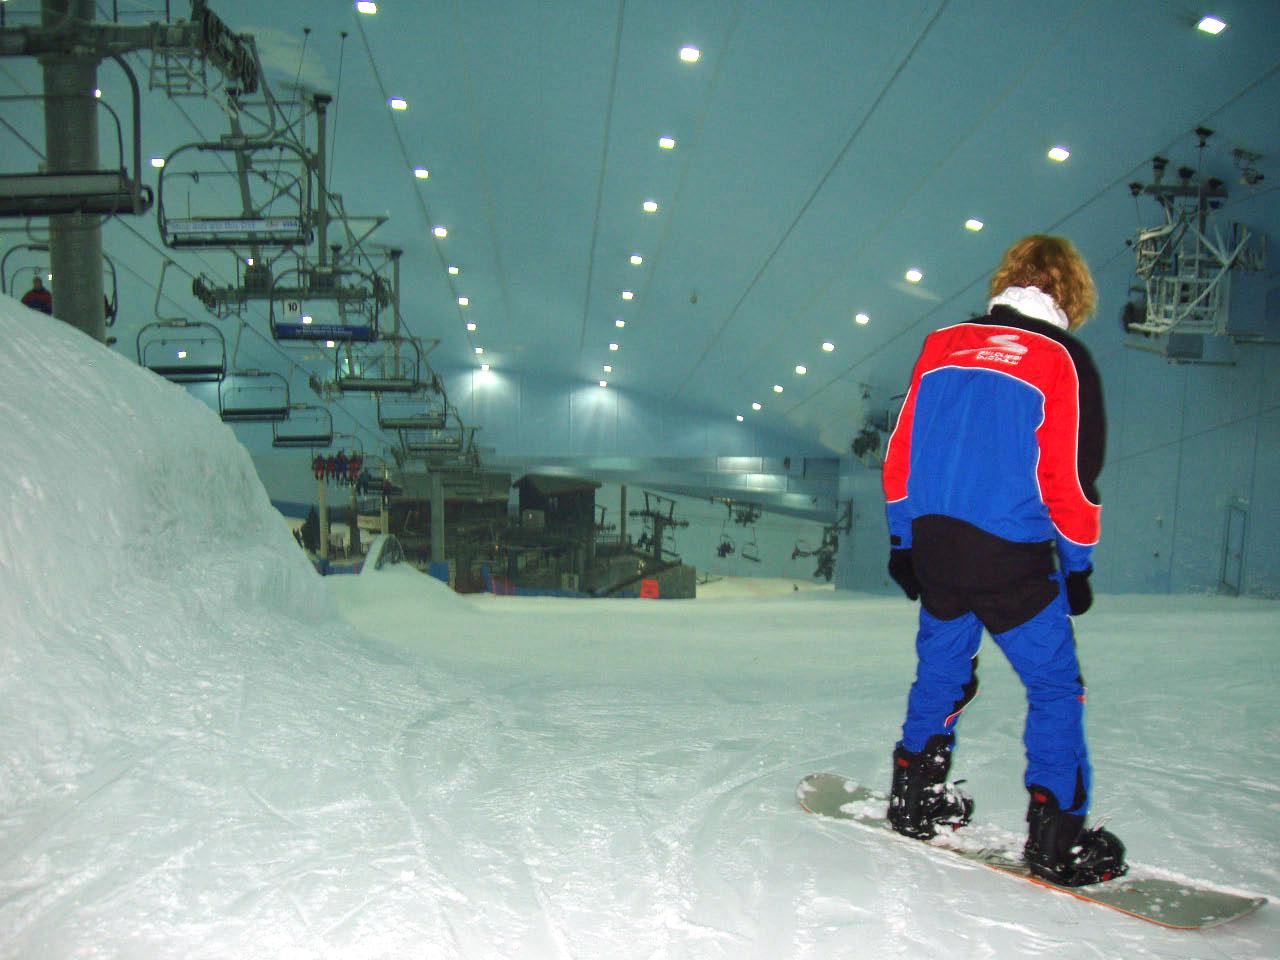 Snowboarding dubai